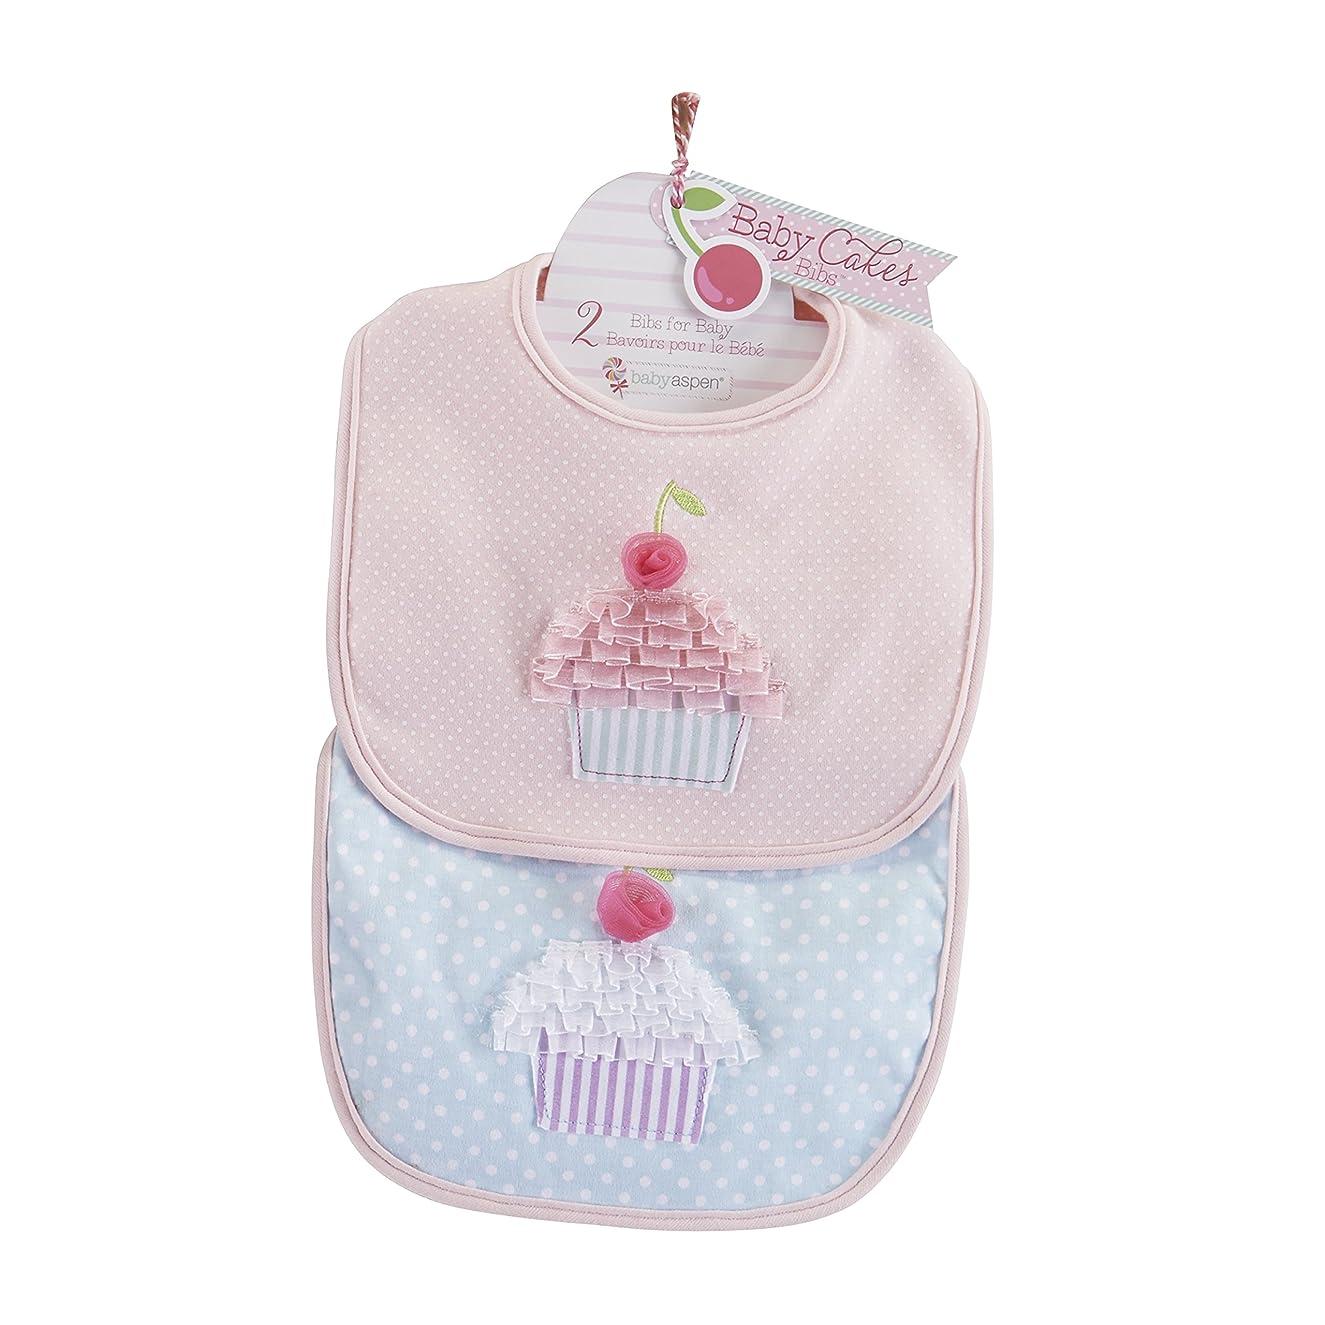 Baby Aspen Baby Cakes 2 Piece Bib Gift Set, Pink